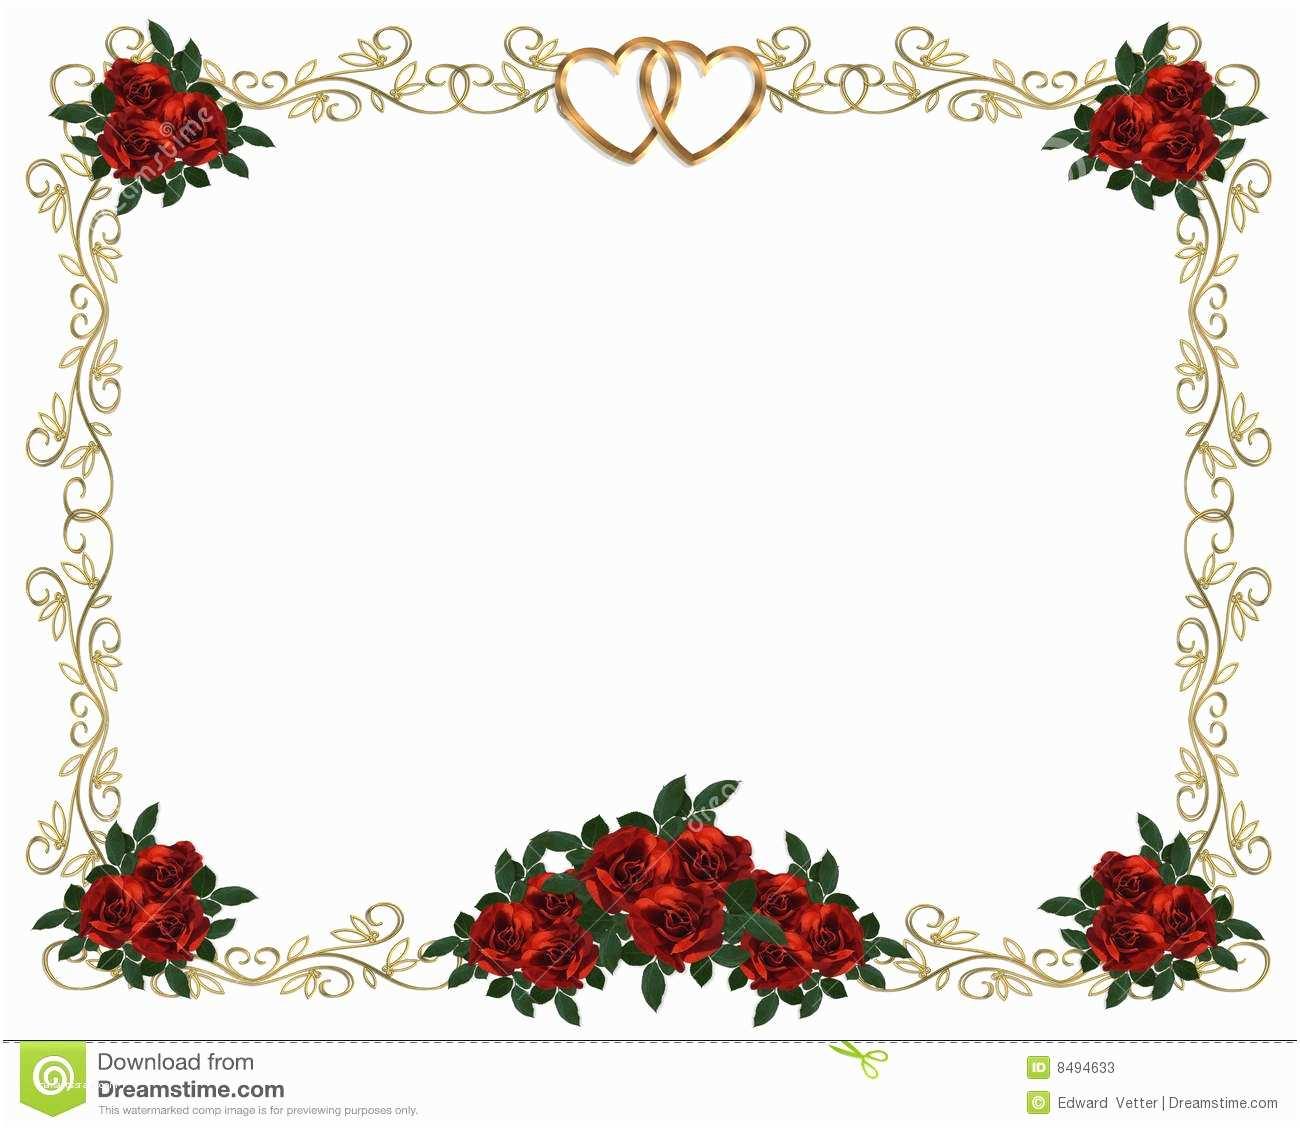 Carte Blanche Design Wedding Invitations Flower Clipart for Wedding Invitations